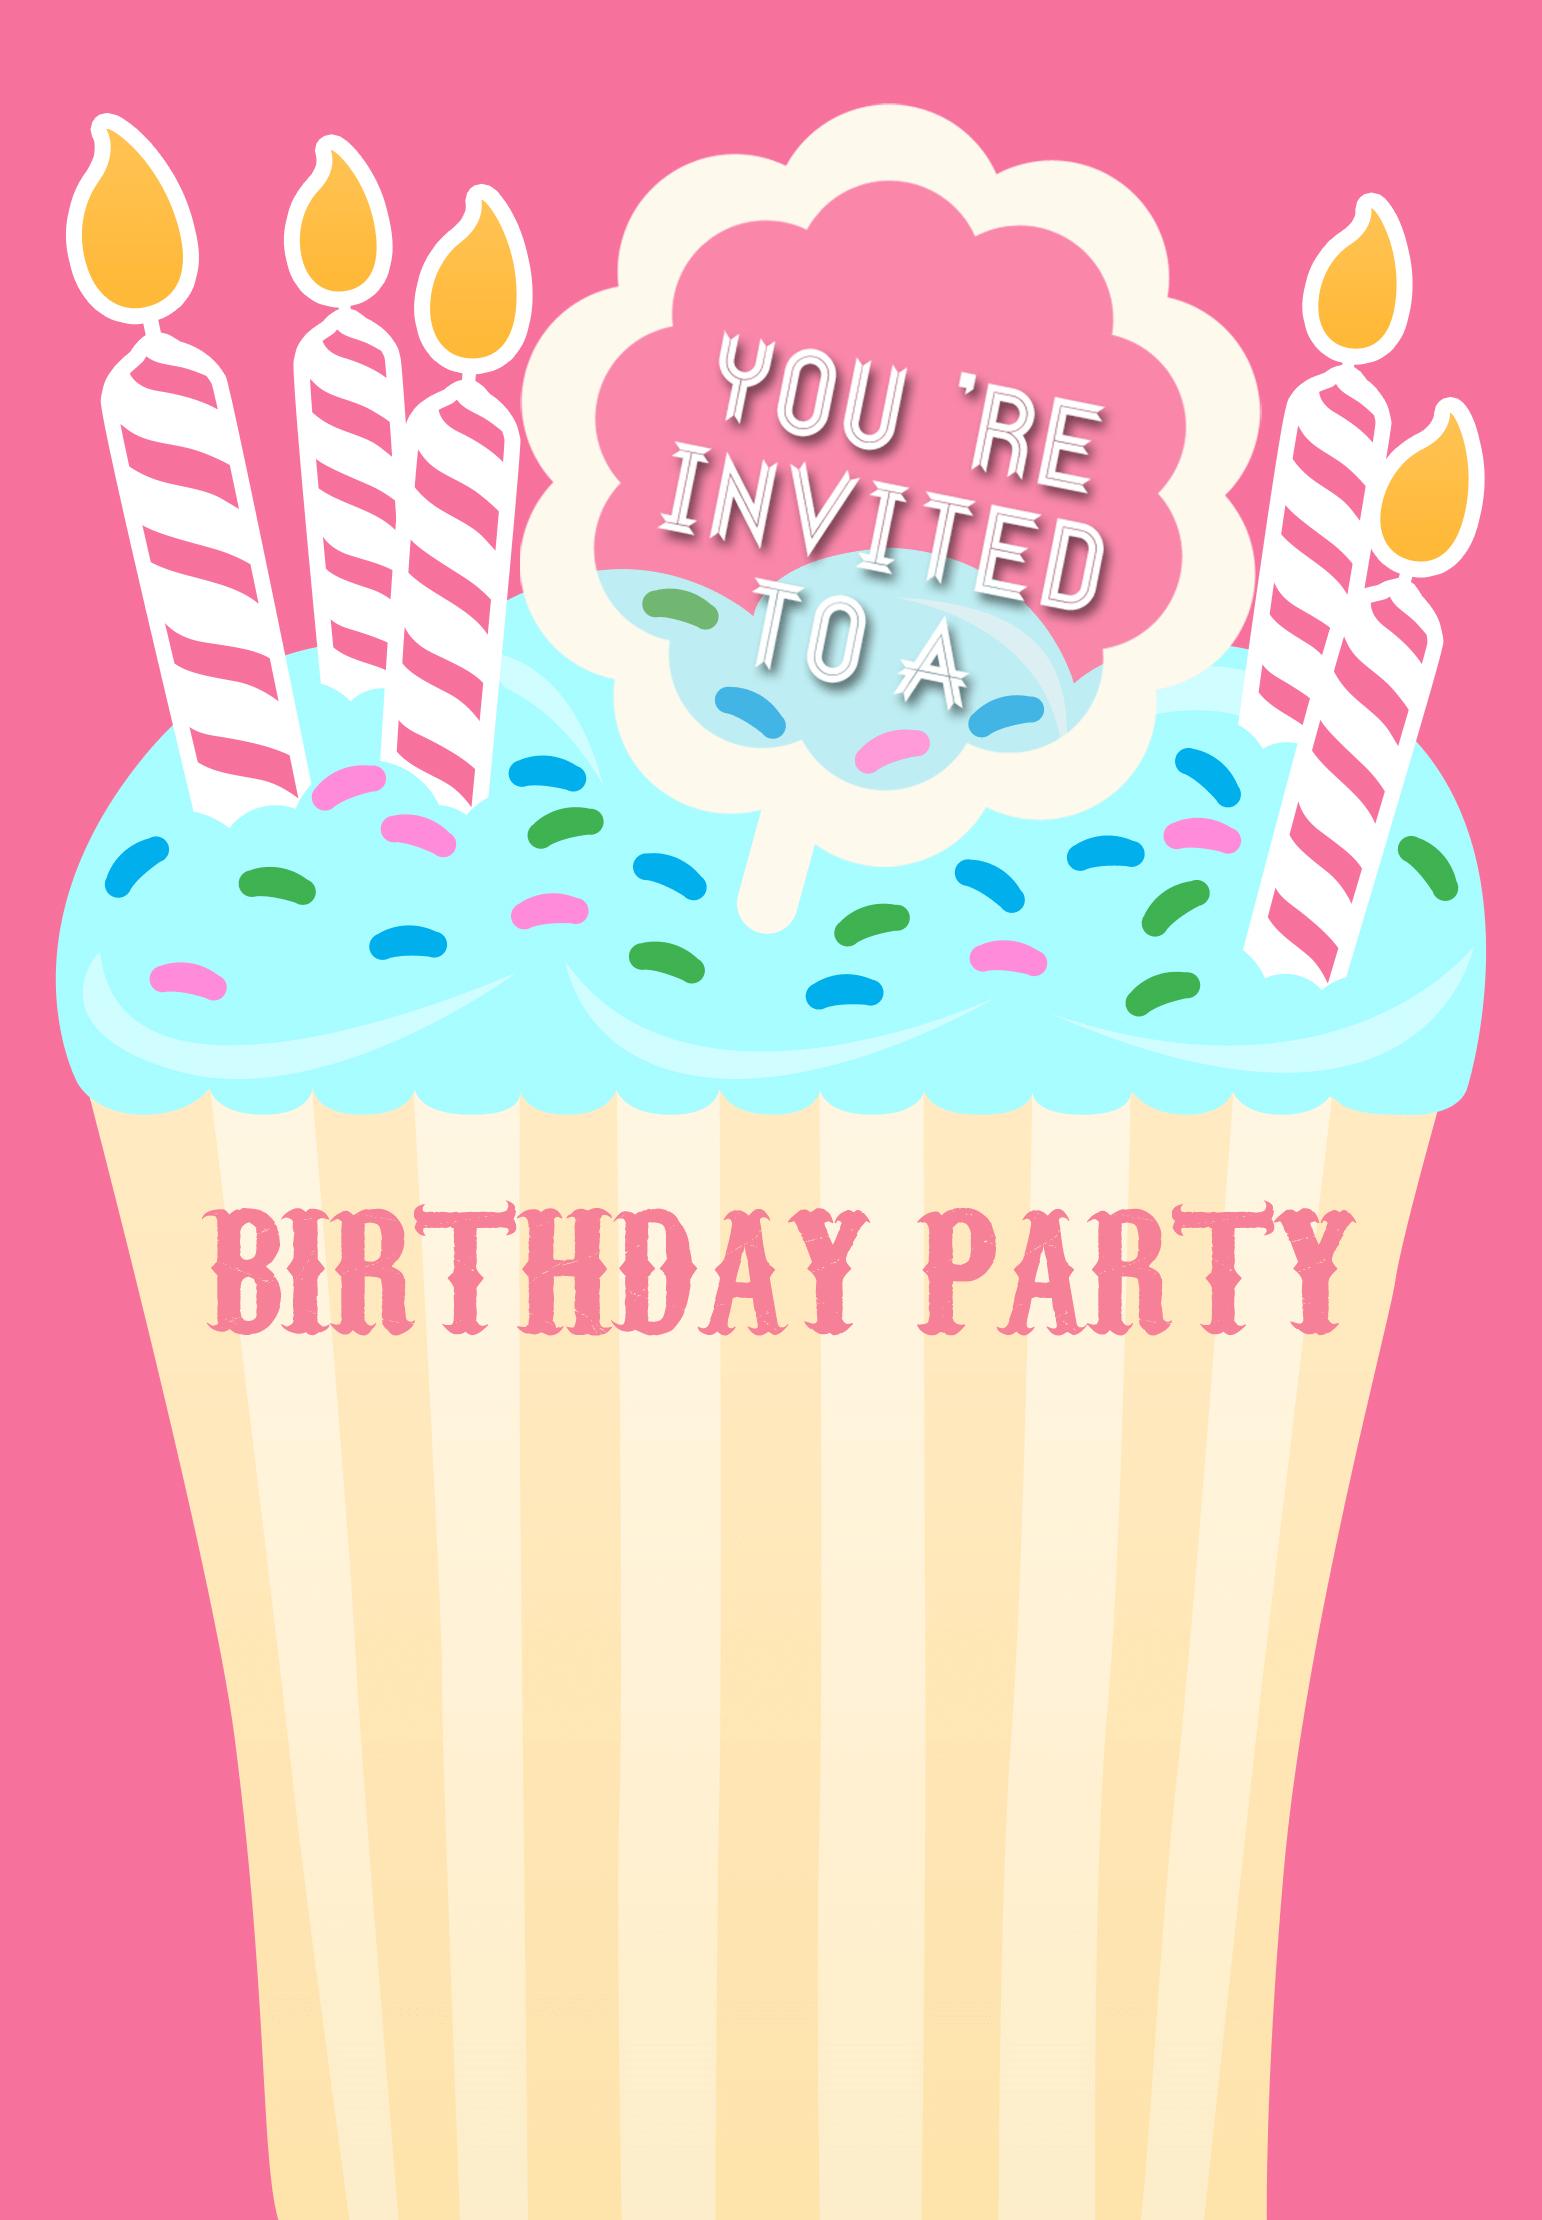 Very Special Day - Free Printable Birthday Invitation Template ...